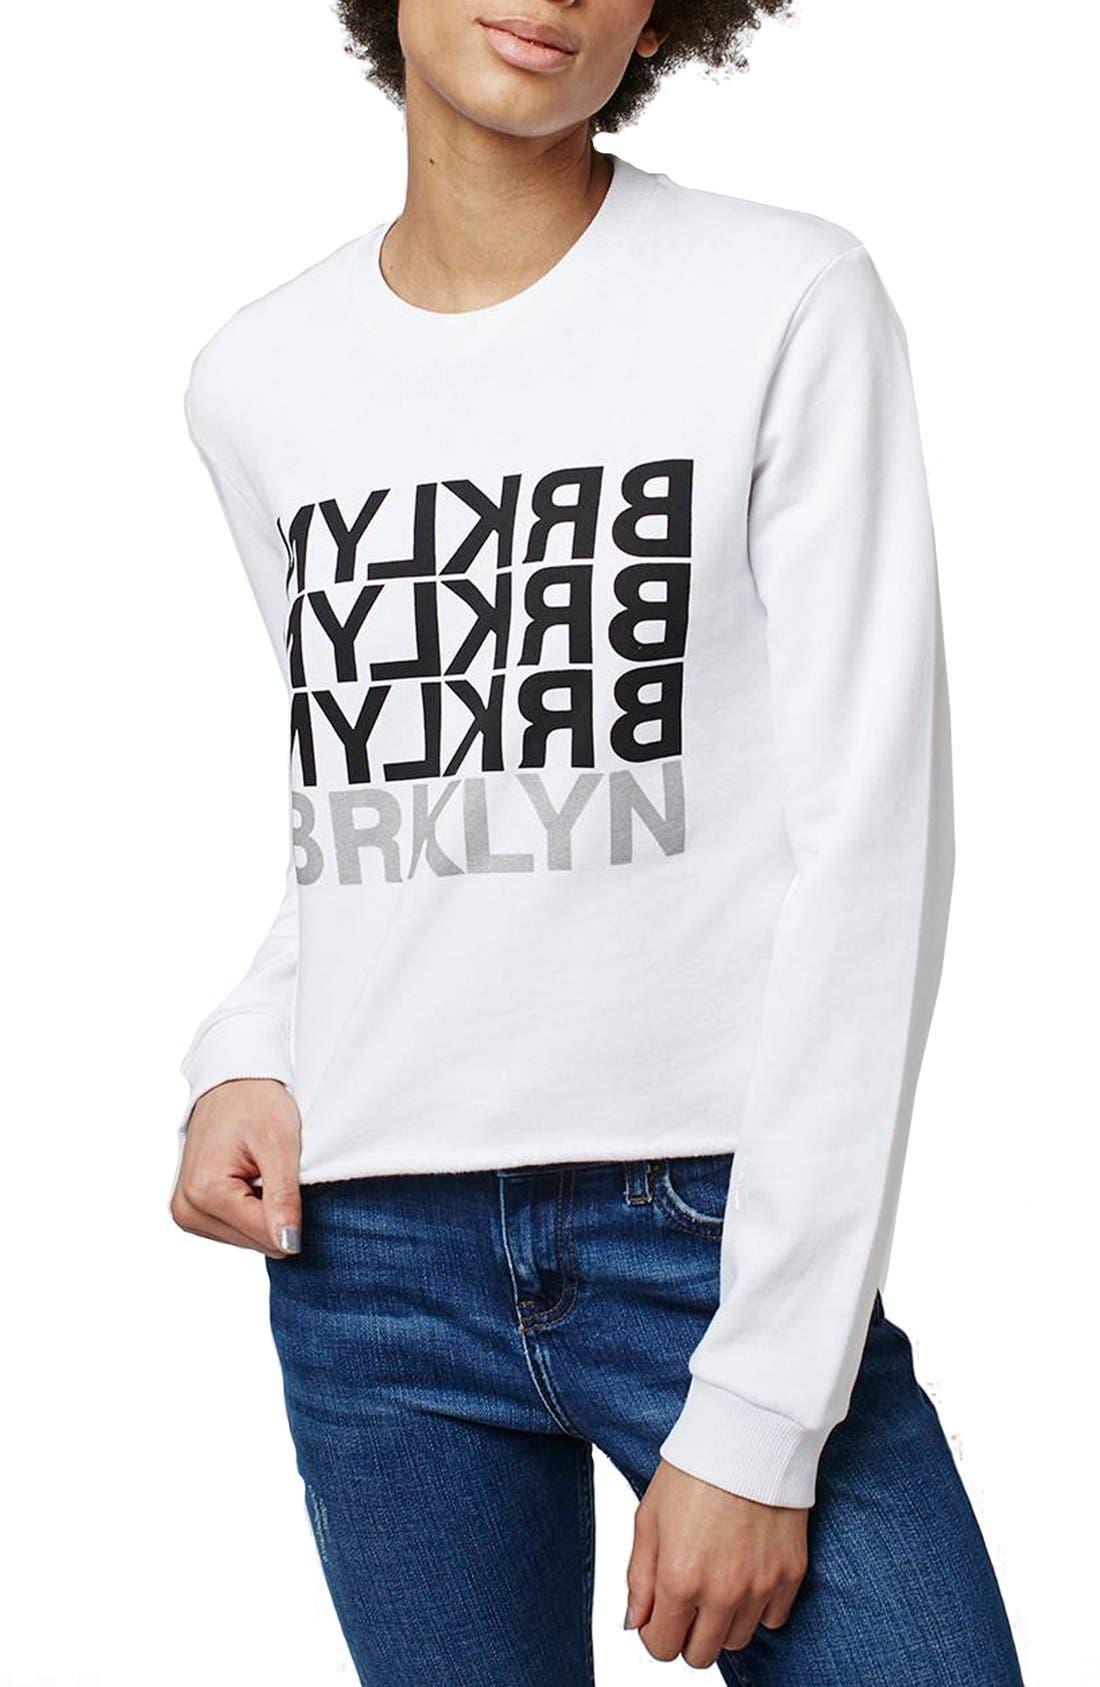 Main Image - Topshop 'Brklyn' Graphic Sweatshirt